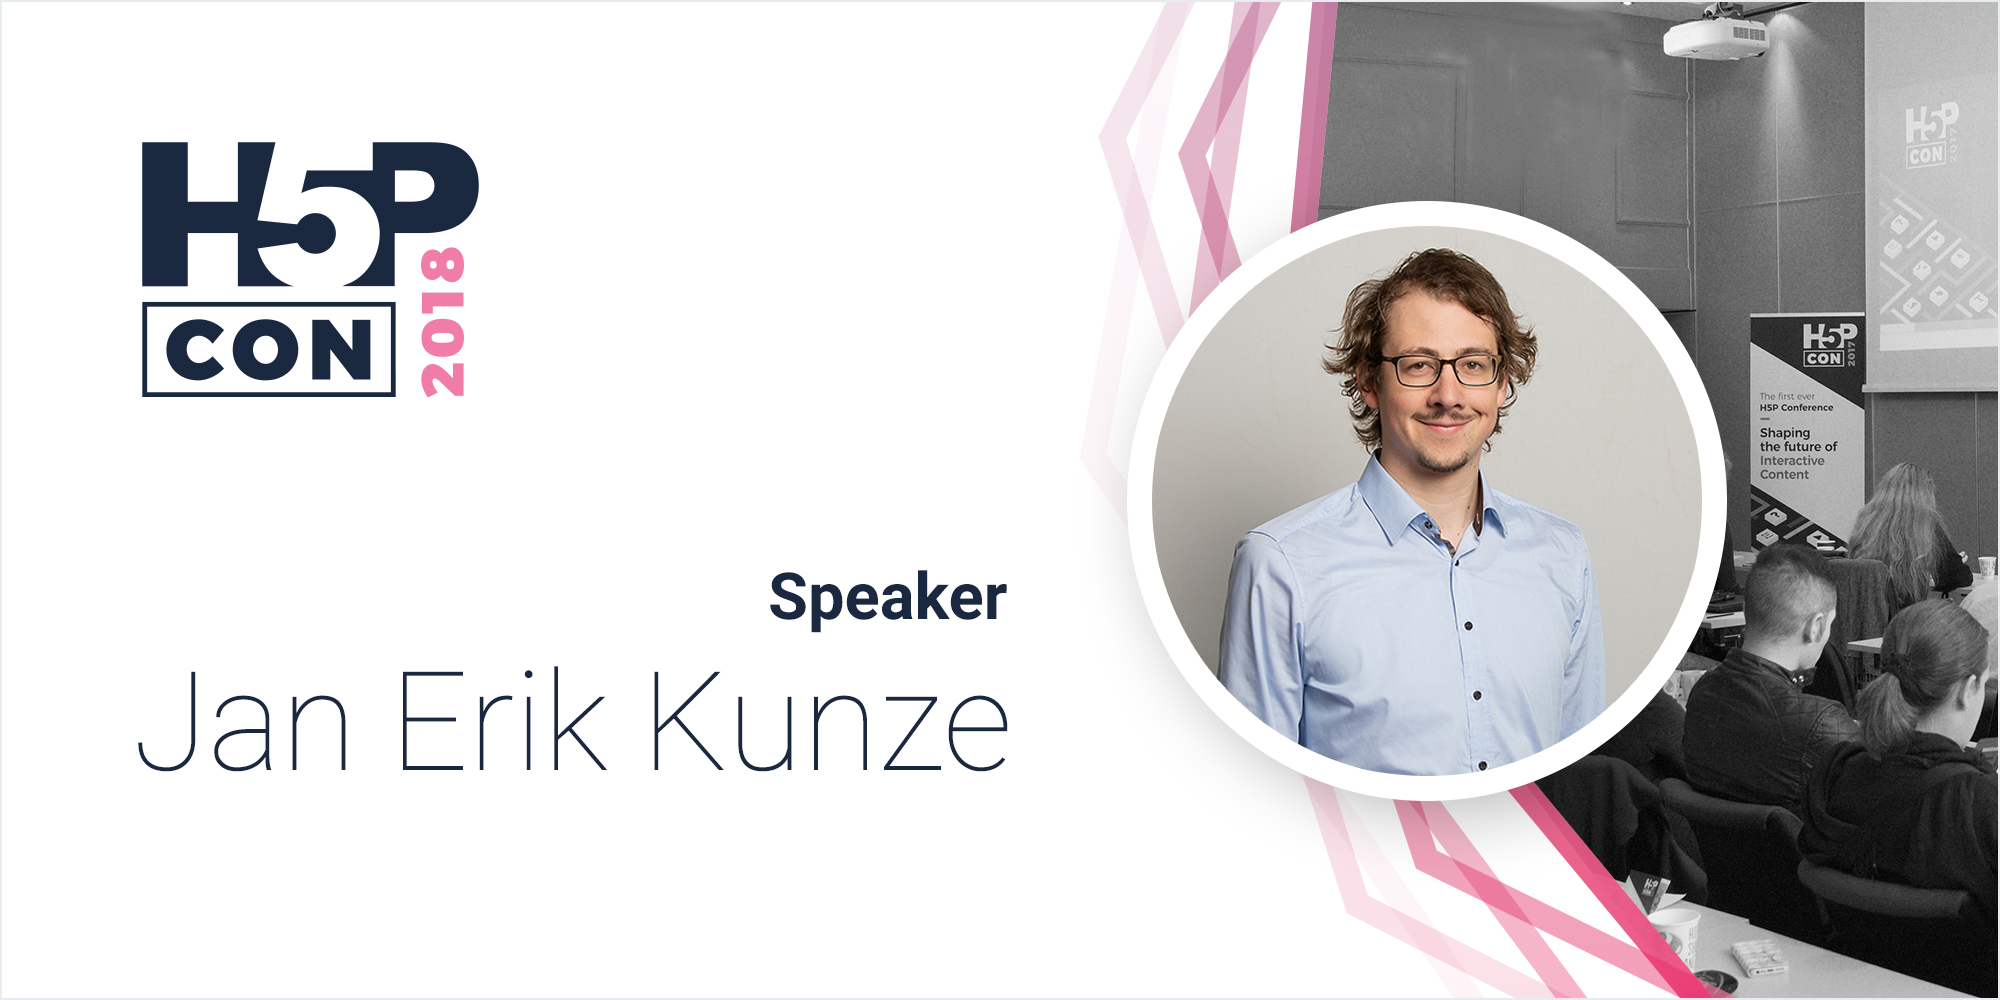 Jan Erik Kunze, Ruhr West University of Applied Sciences, Germany